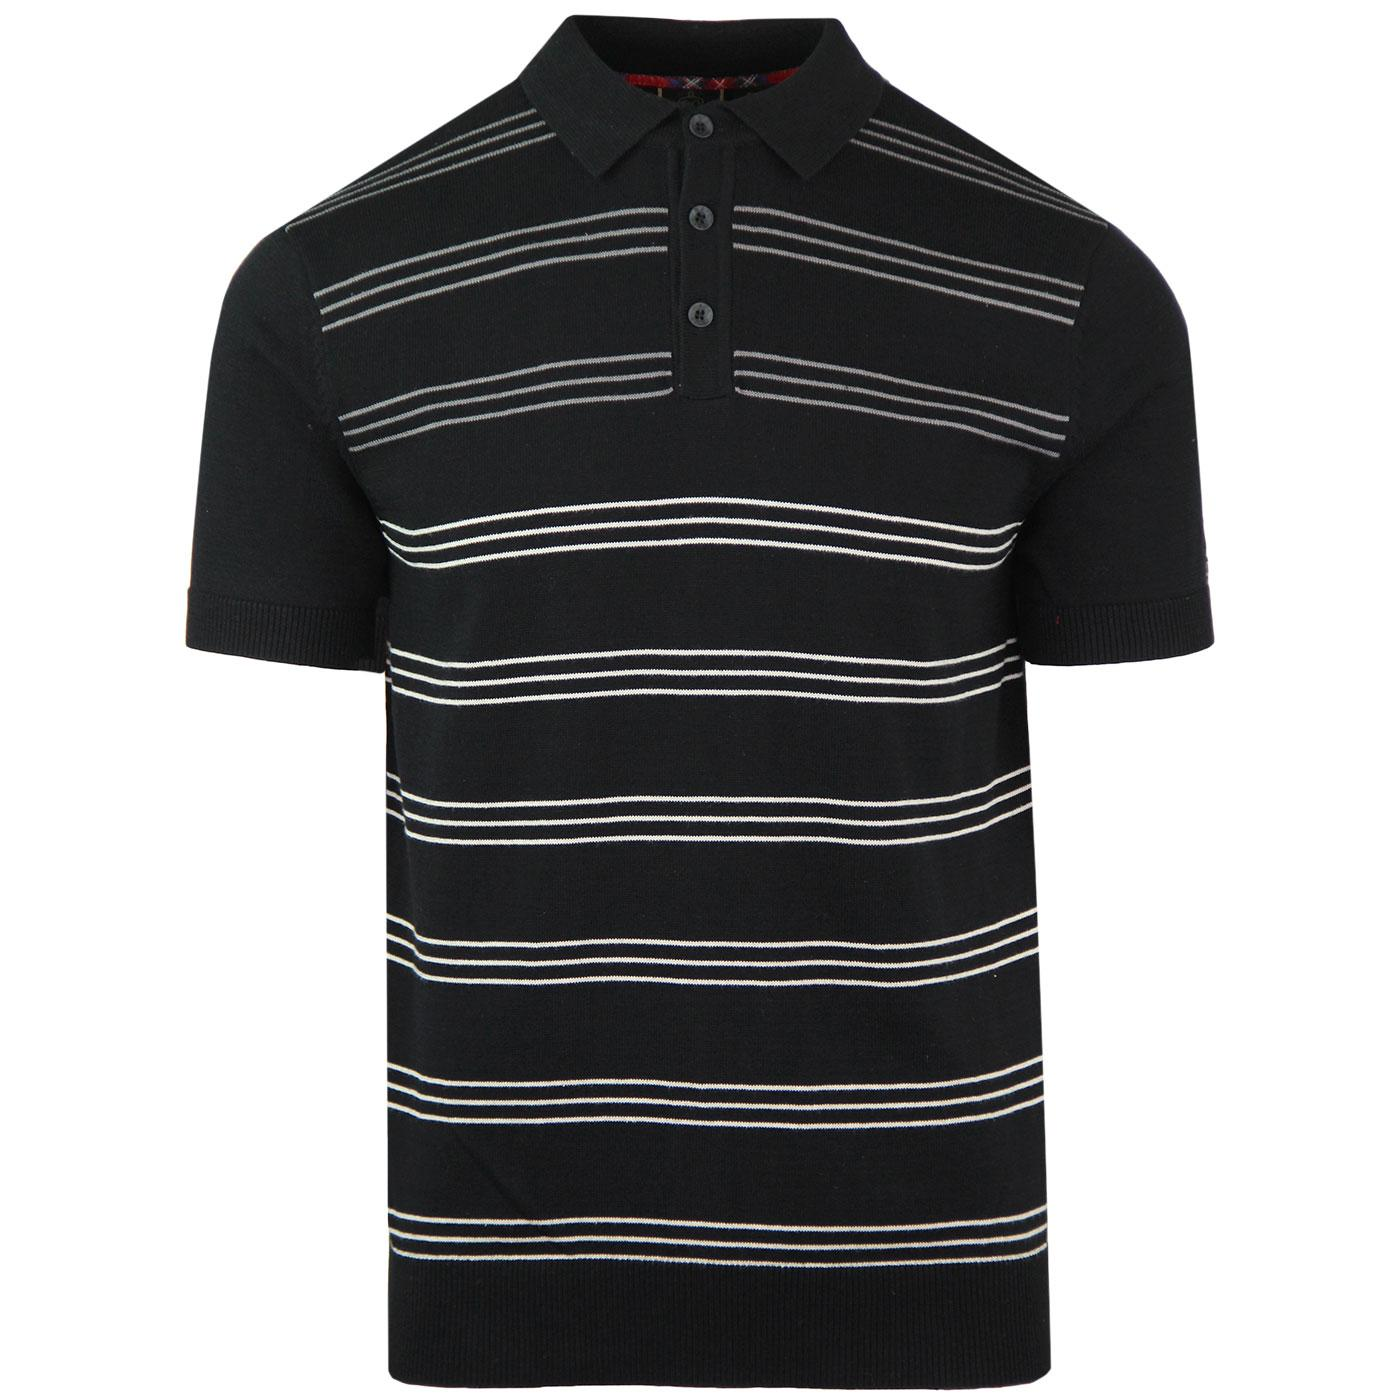 Penge MERC Retro Mod Stripe Knit Polo Shirt BLACK